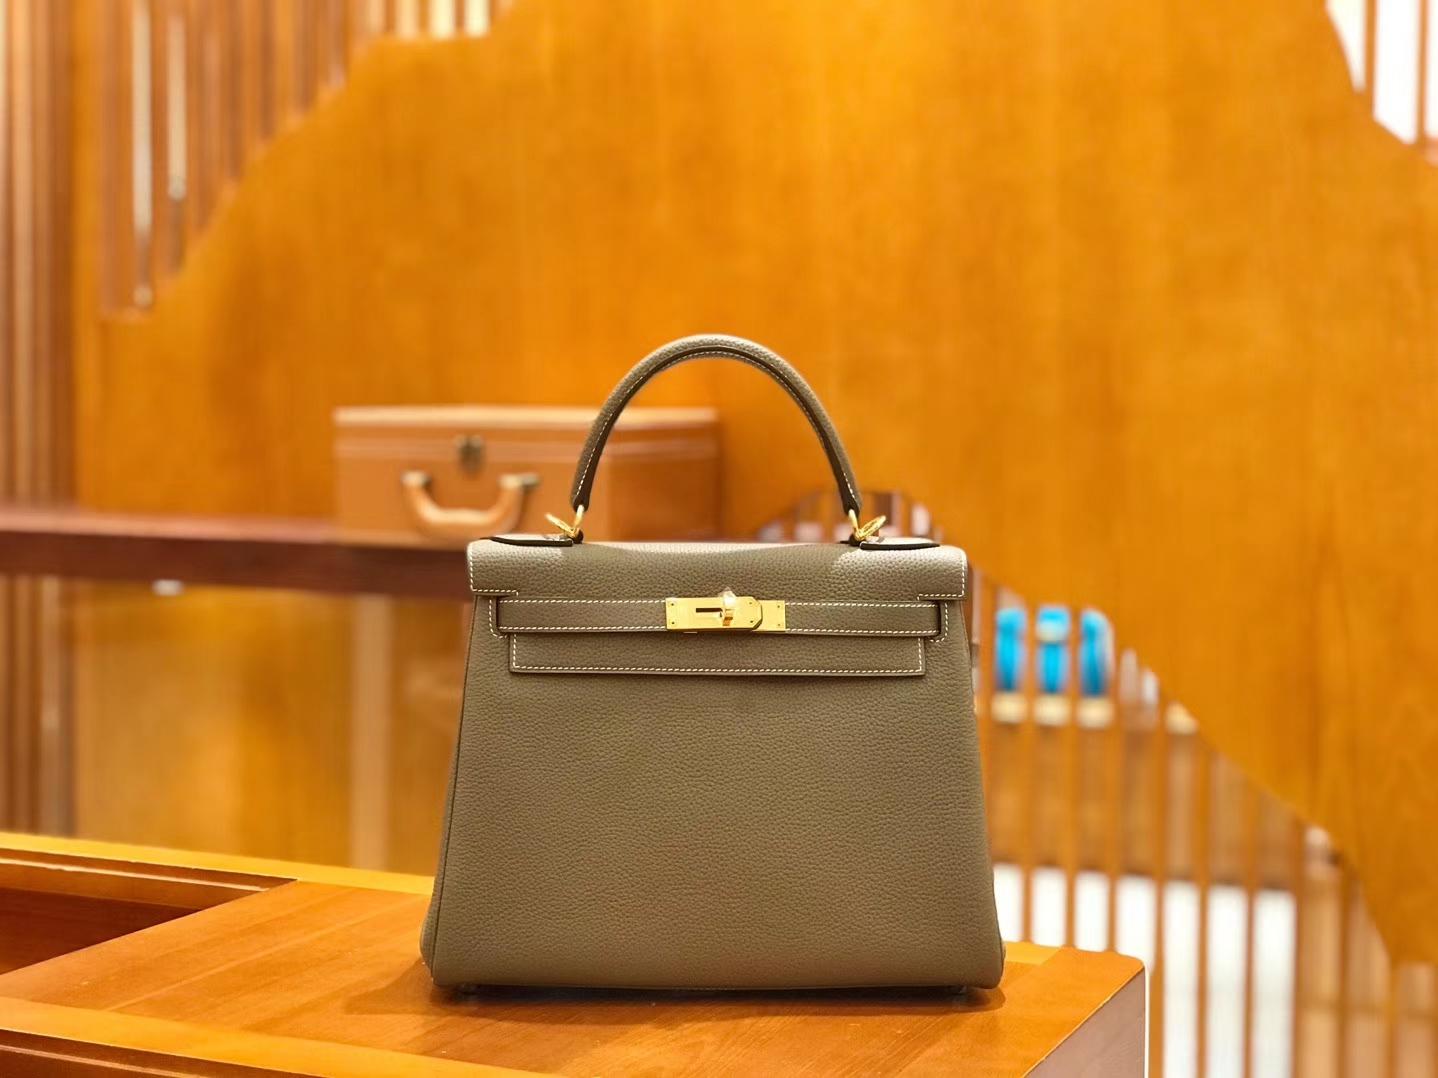 Hermès(爱马仕)Kelly 28cm togo 牛皮 大象灰 金扣 全手工缝制 现货